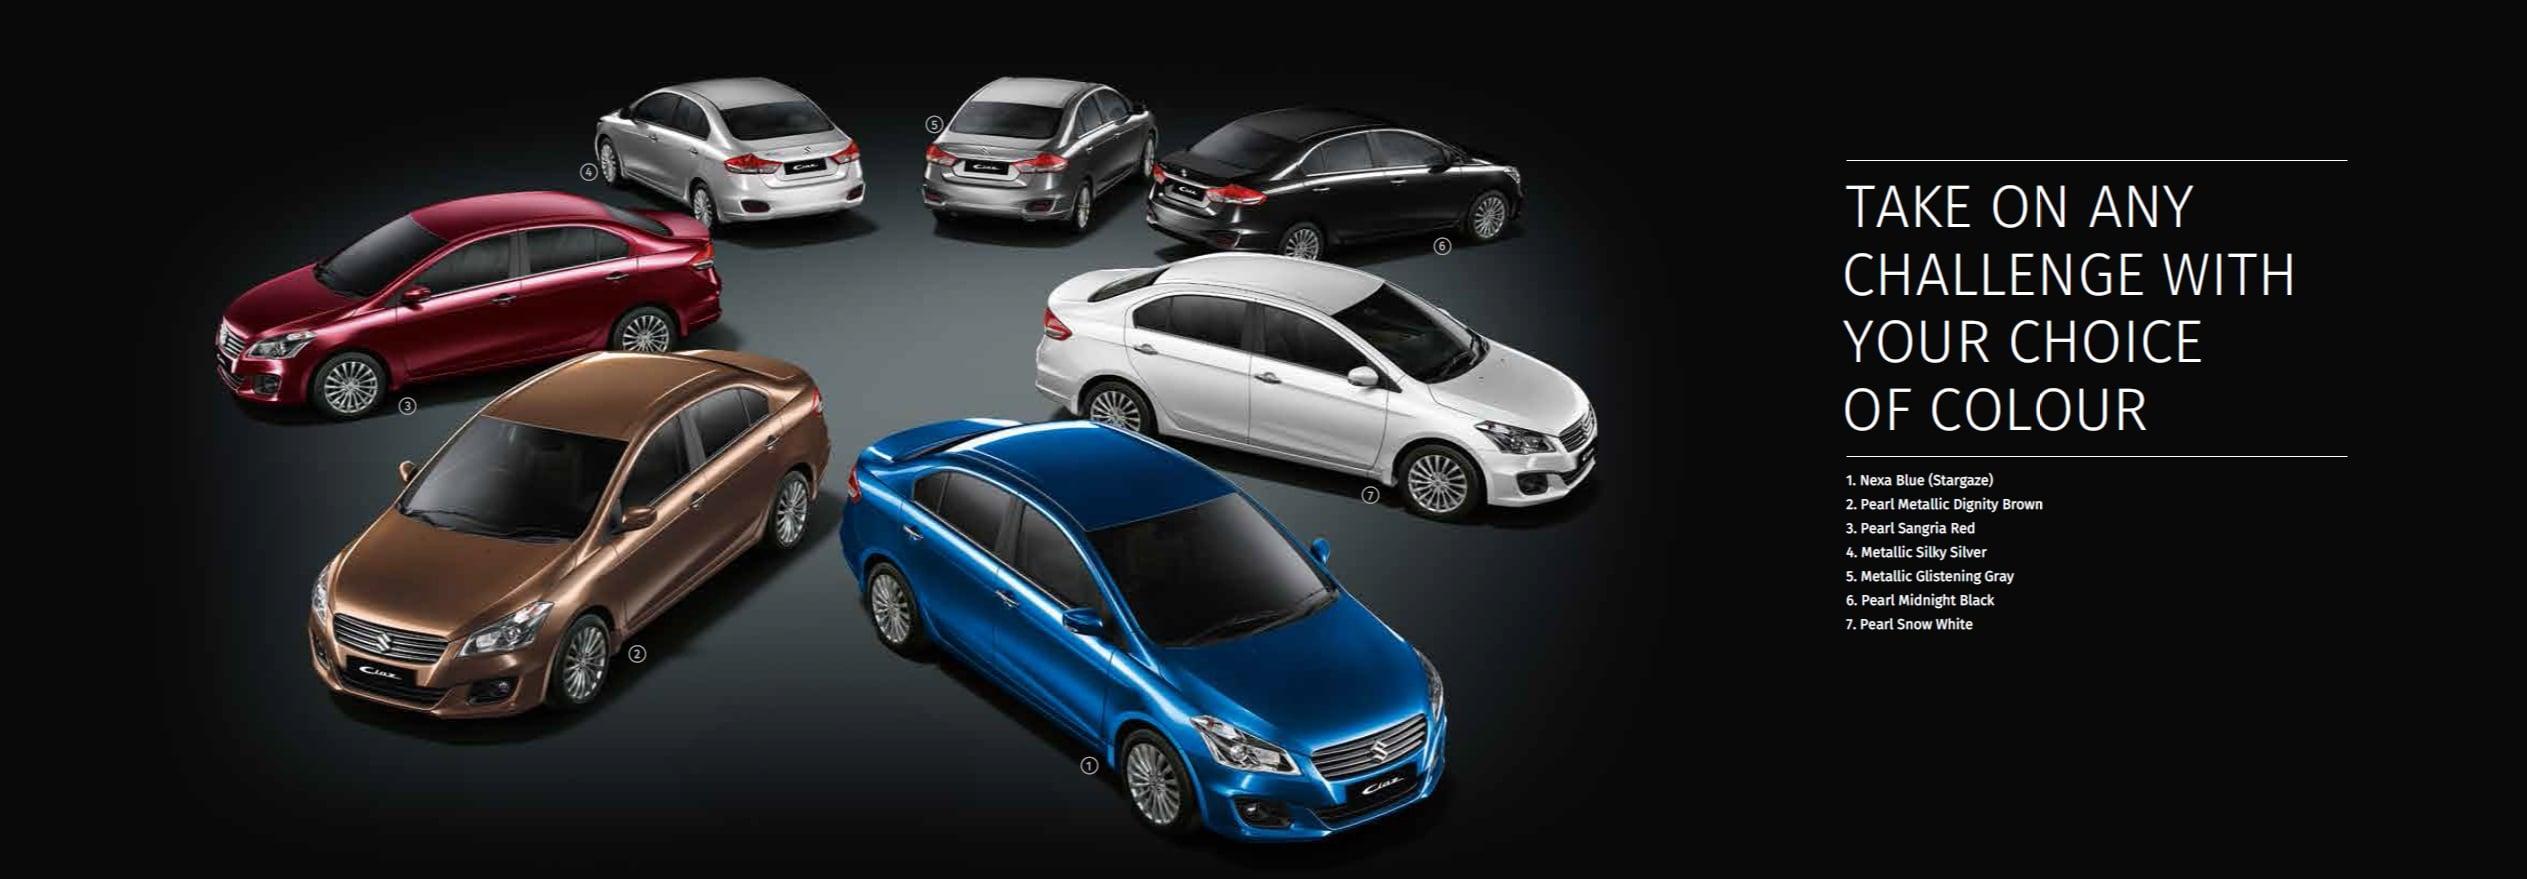 2017 Maruti Suzuki Ciaz Nexa Price Specifications